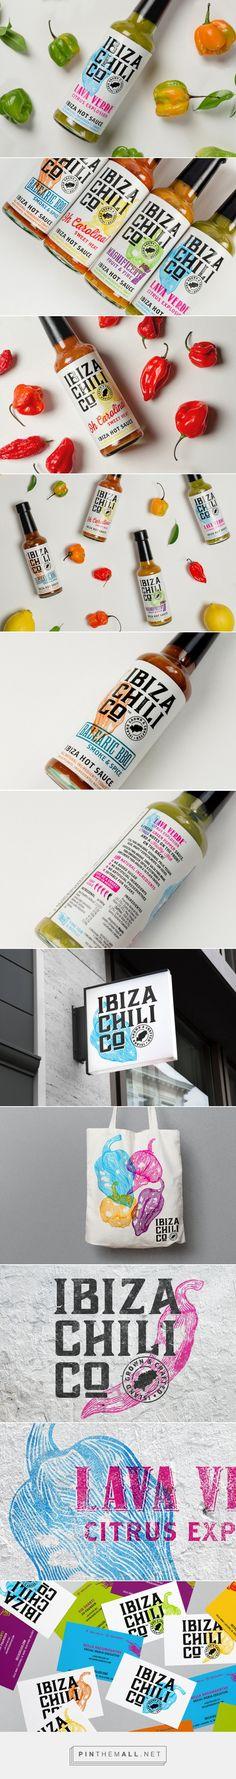 Ibiza Chili Co /  Ibiza Hot Sauces by Studio Parr